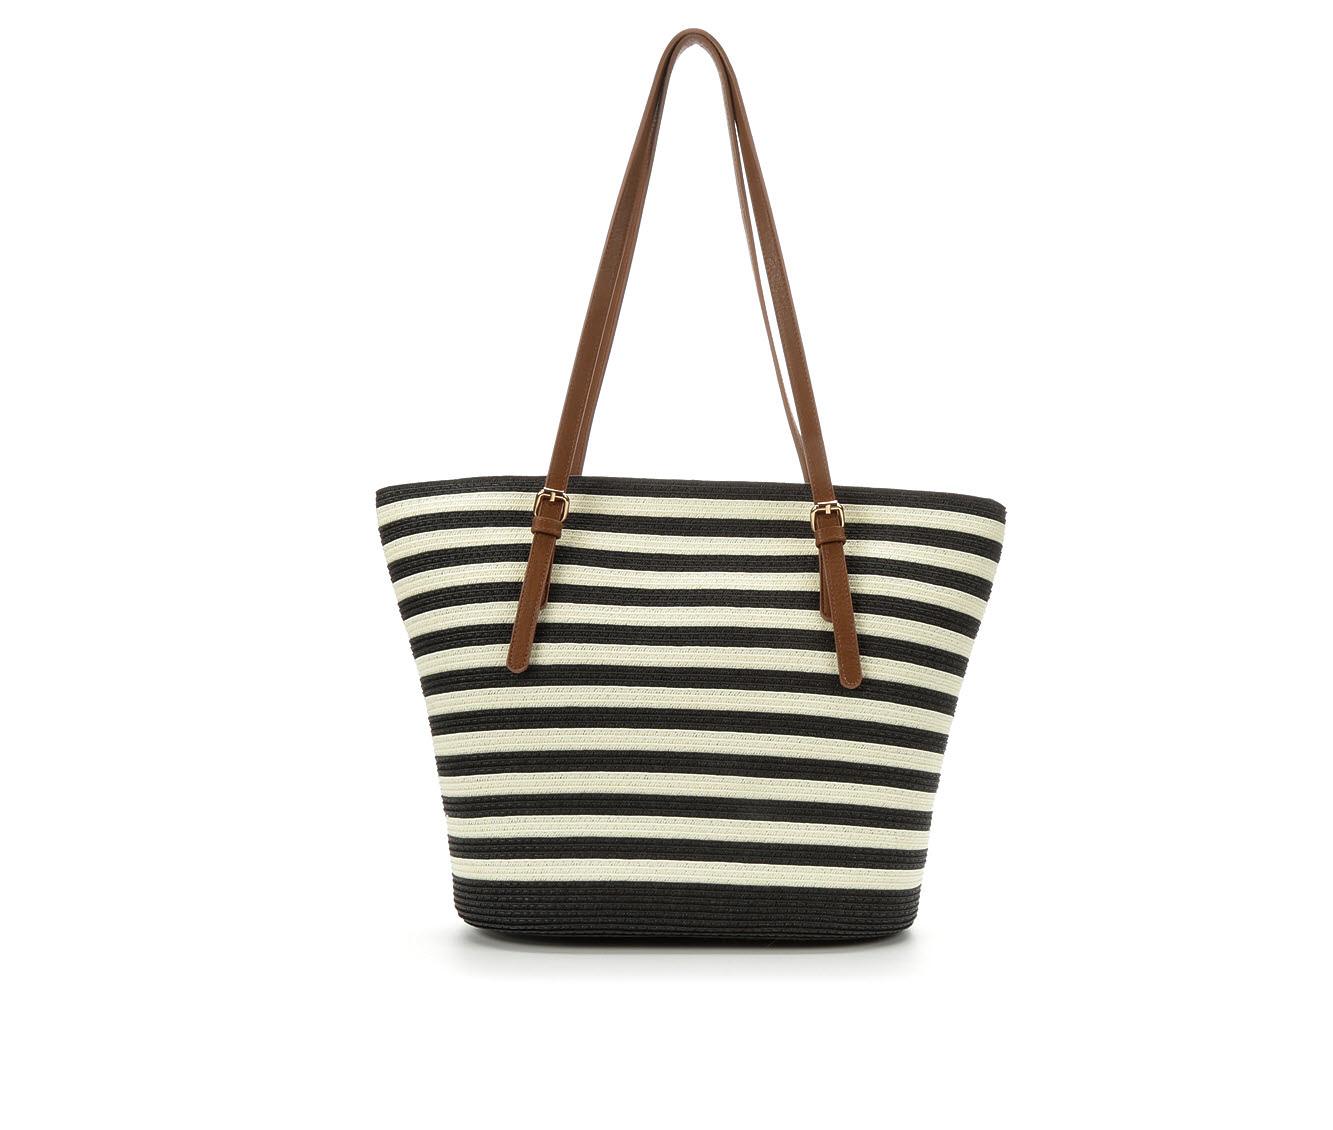 Bueno Of California Papered Straw Tote Handbag (Black)